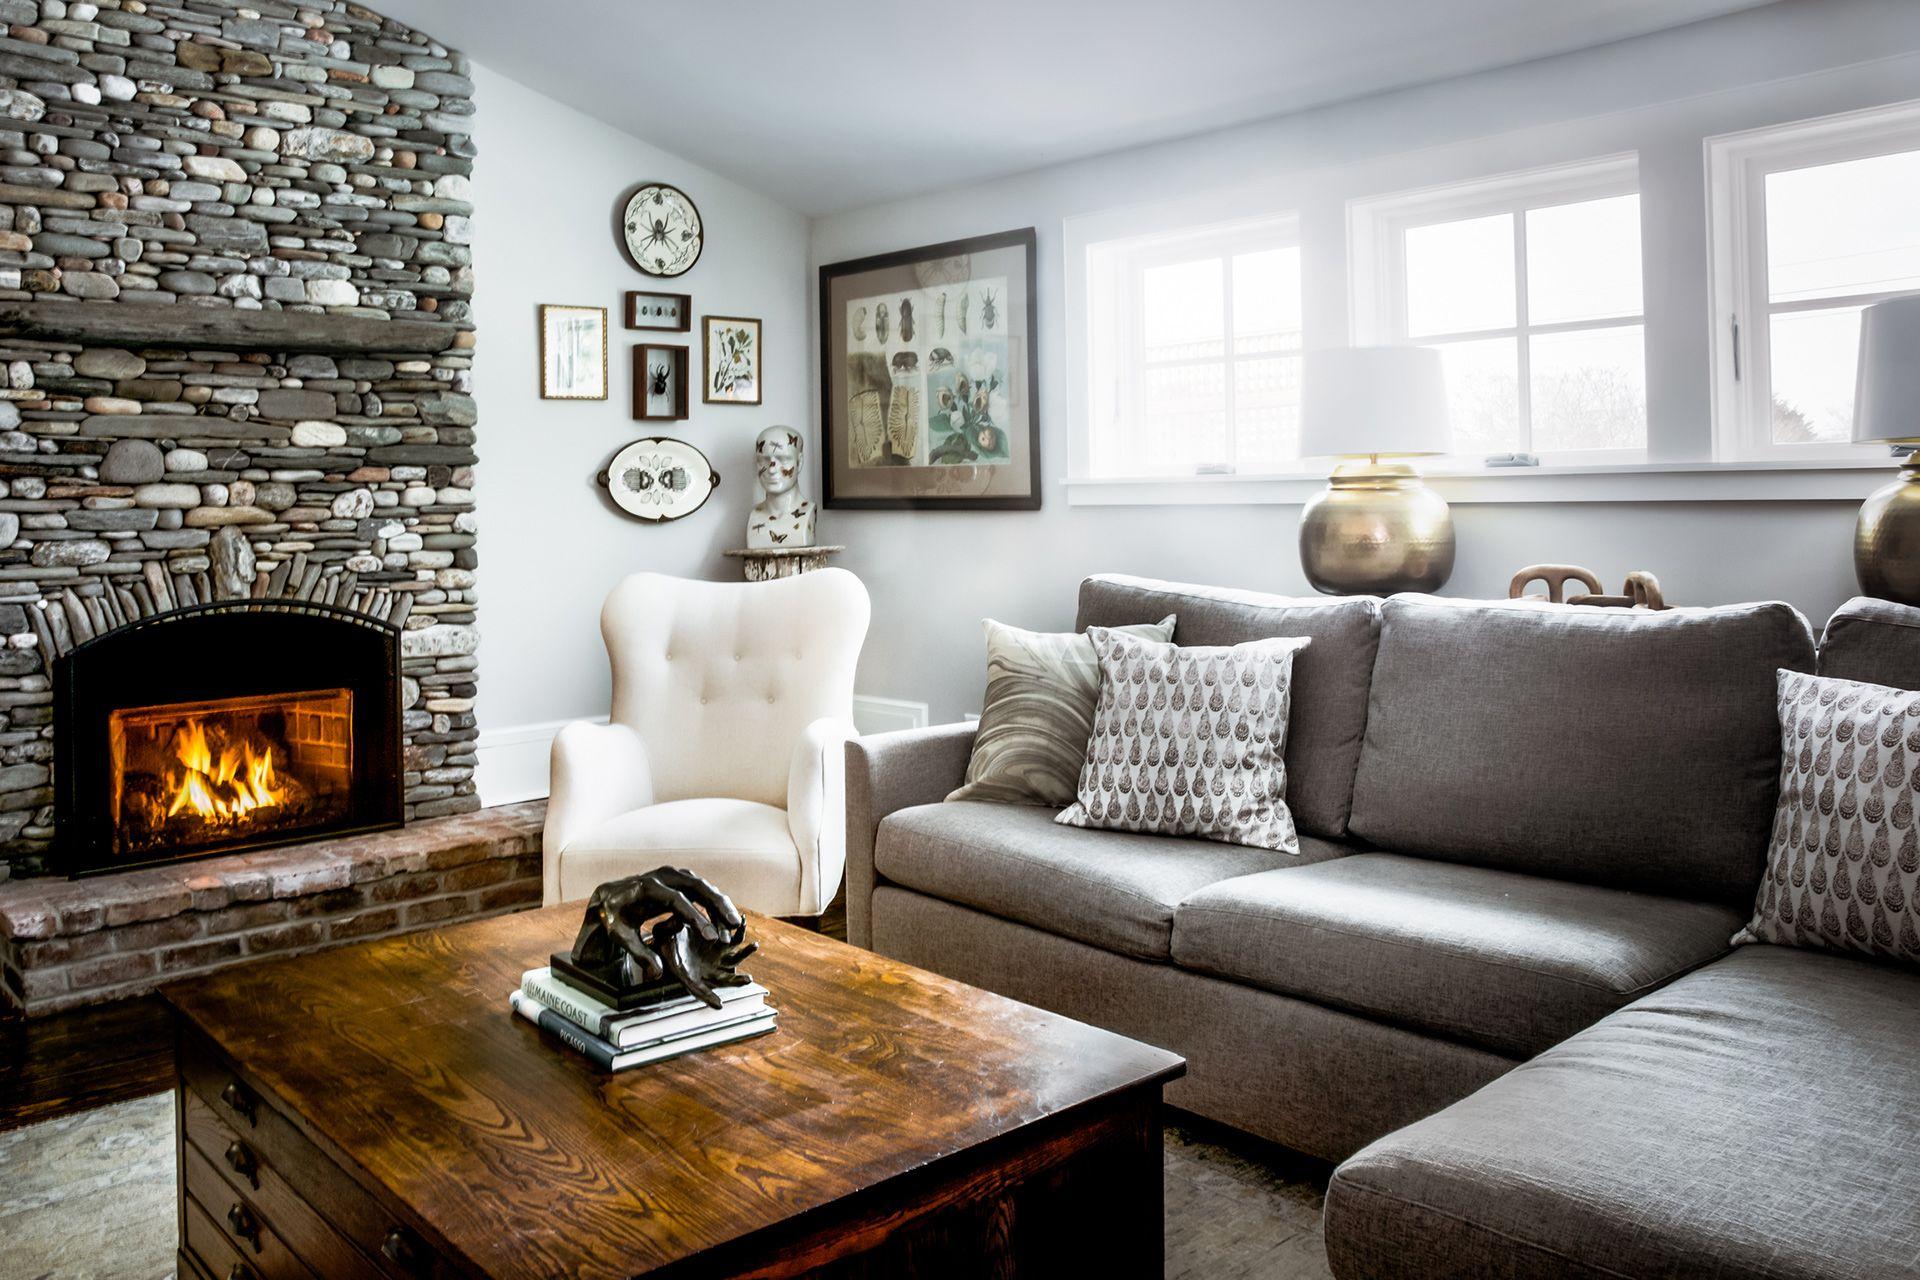 11 Living Room Decorating Ideas Every Homeowner Should Know Interior Design Home Decor Home